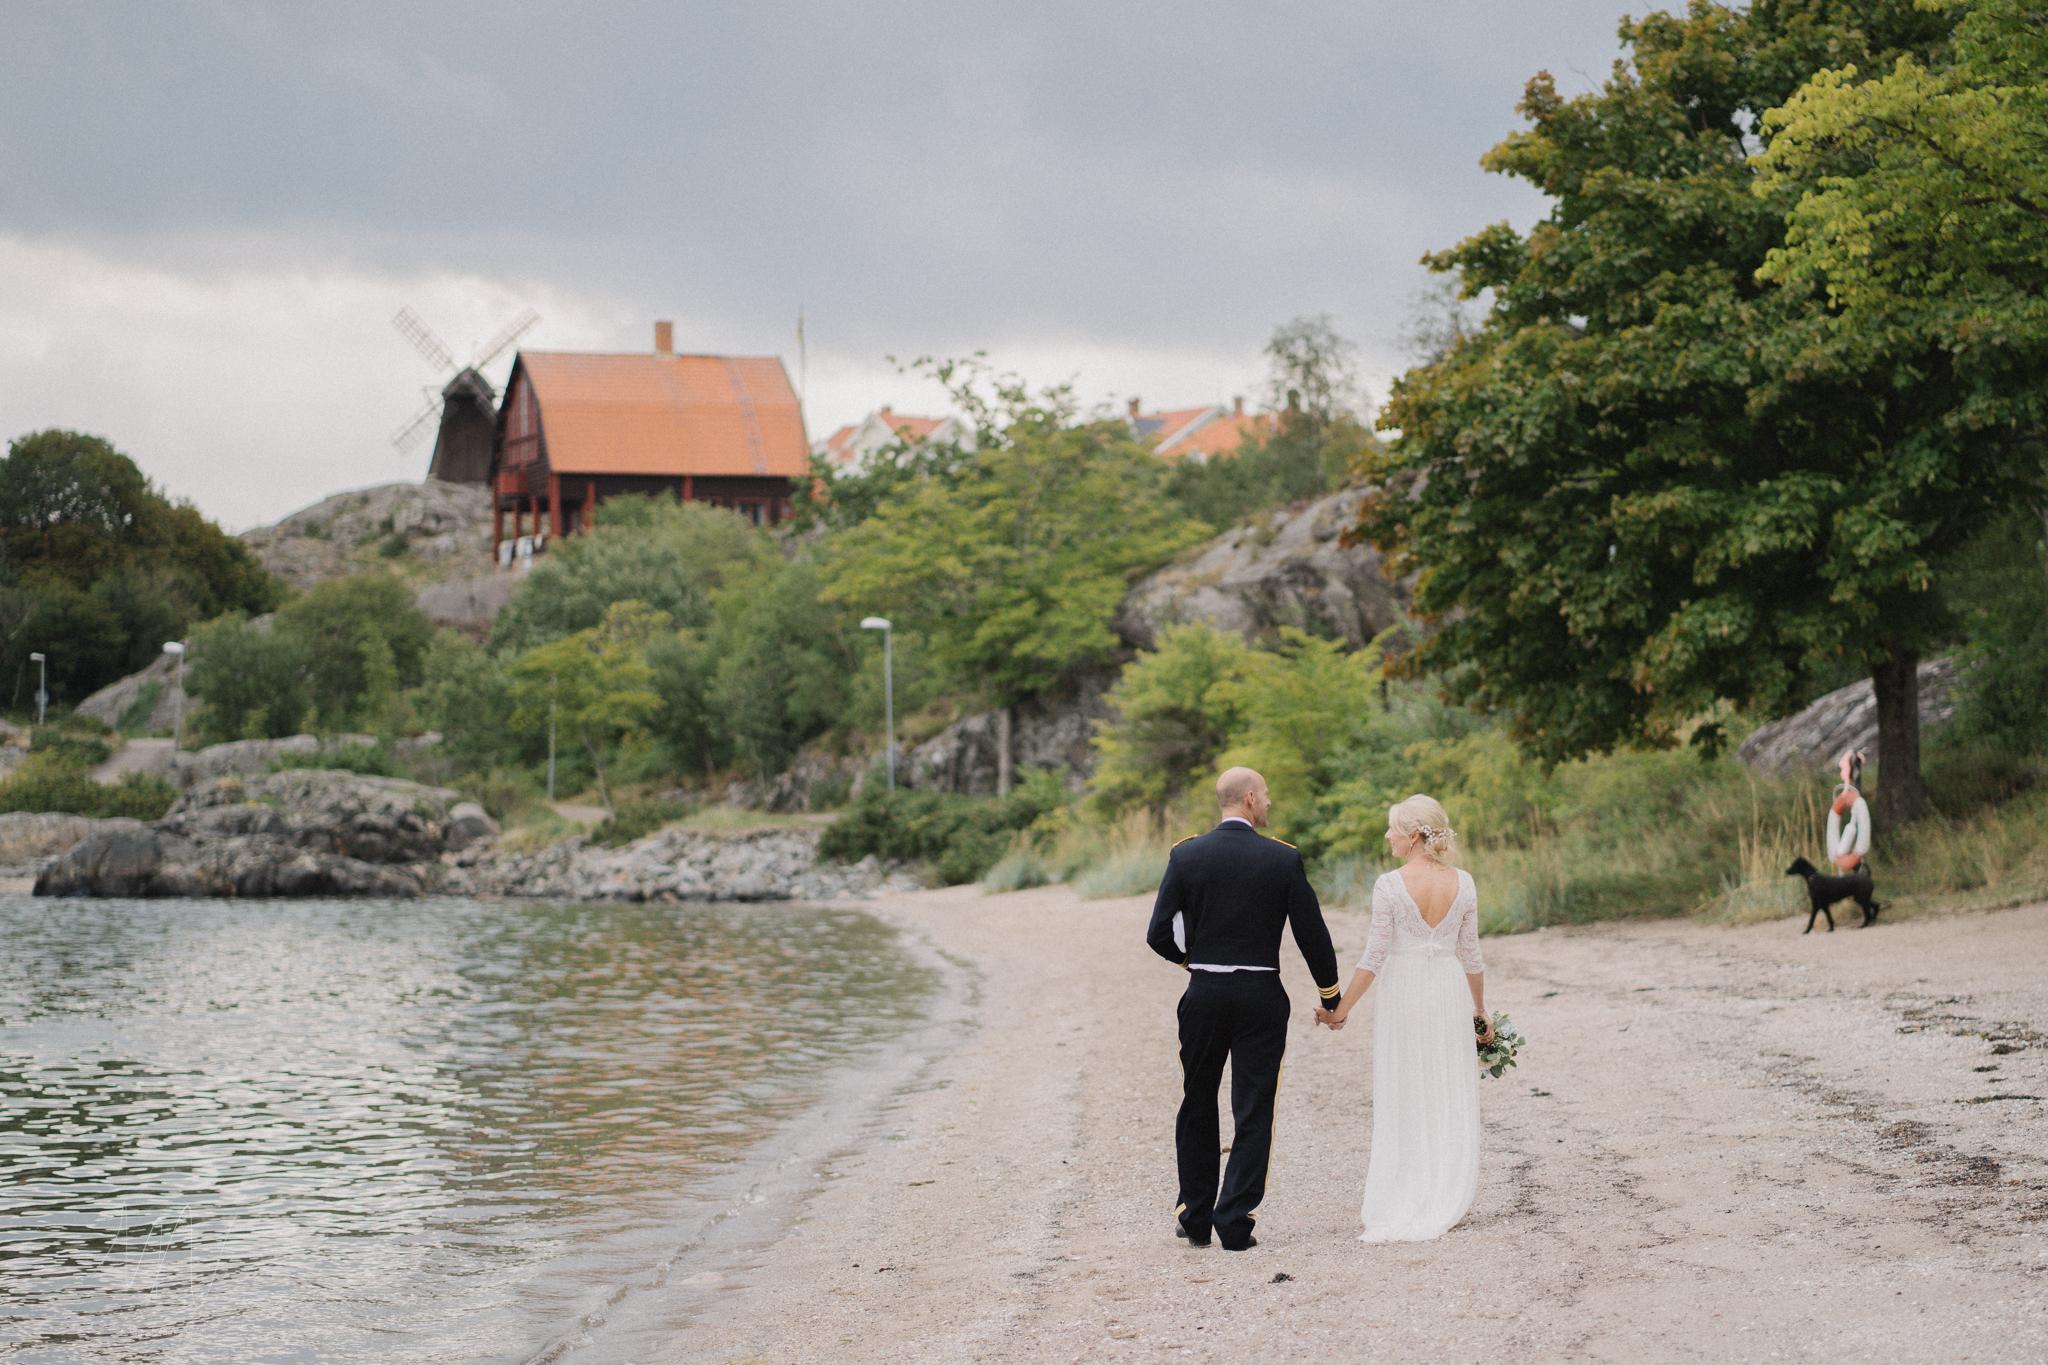 Bröllop-fotografmaxnorin.se-MariaMarcus-397.JPG